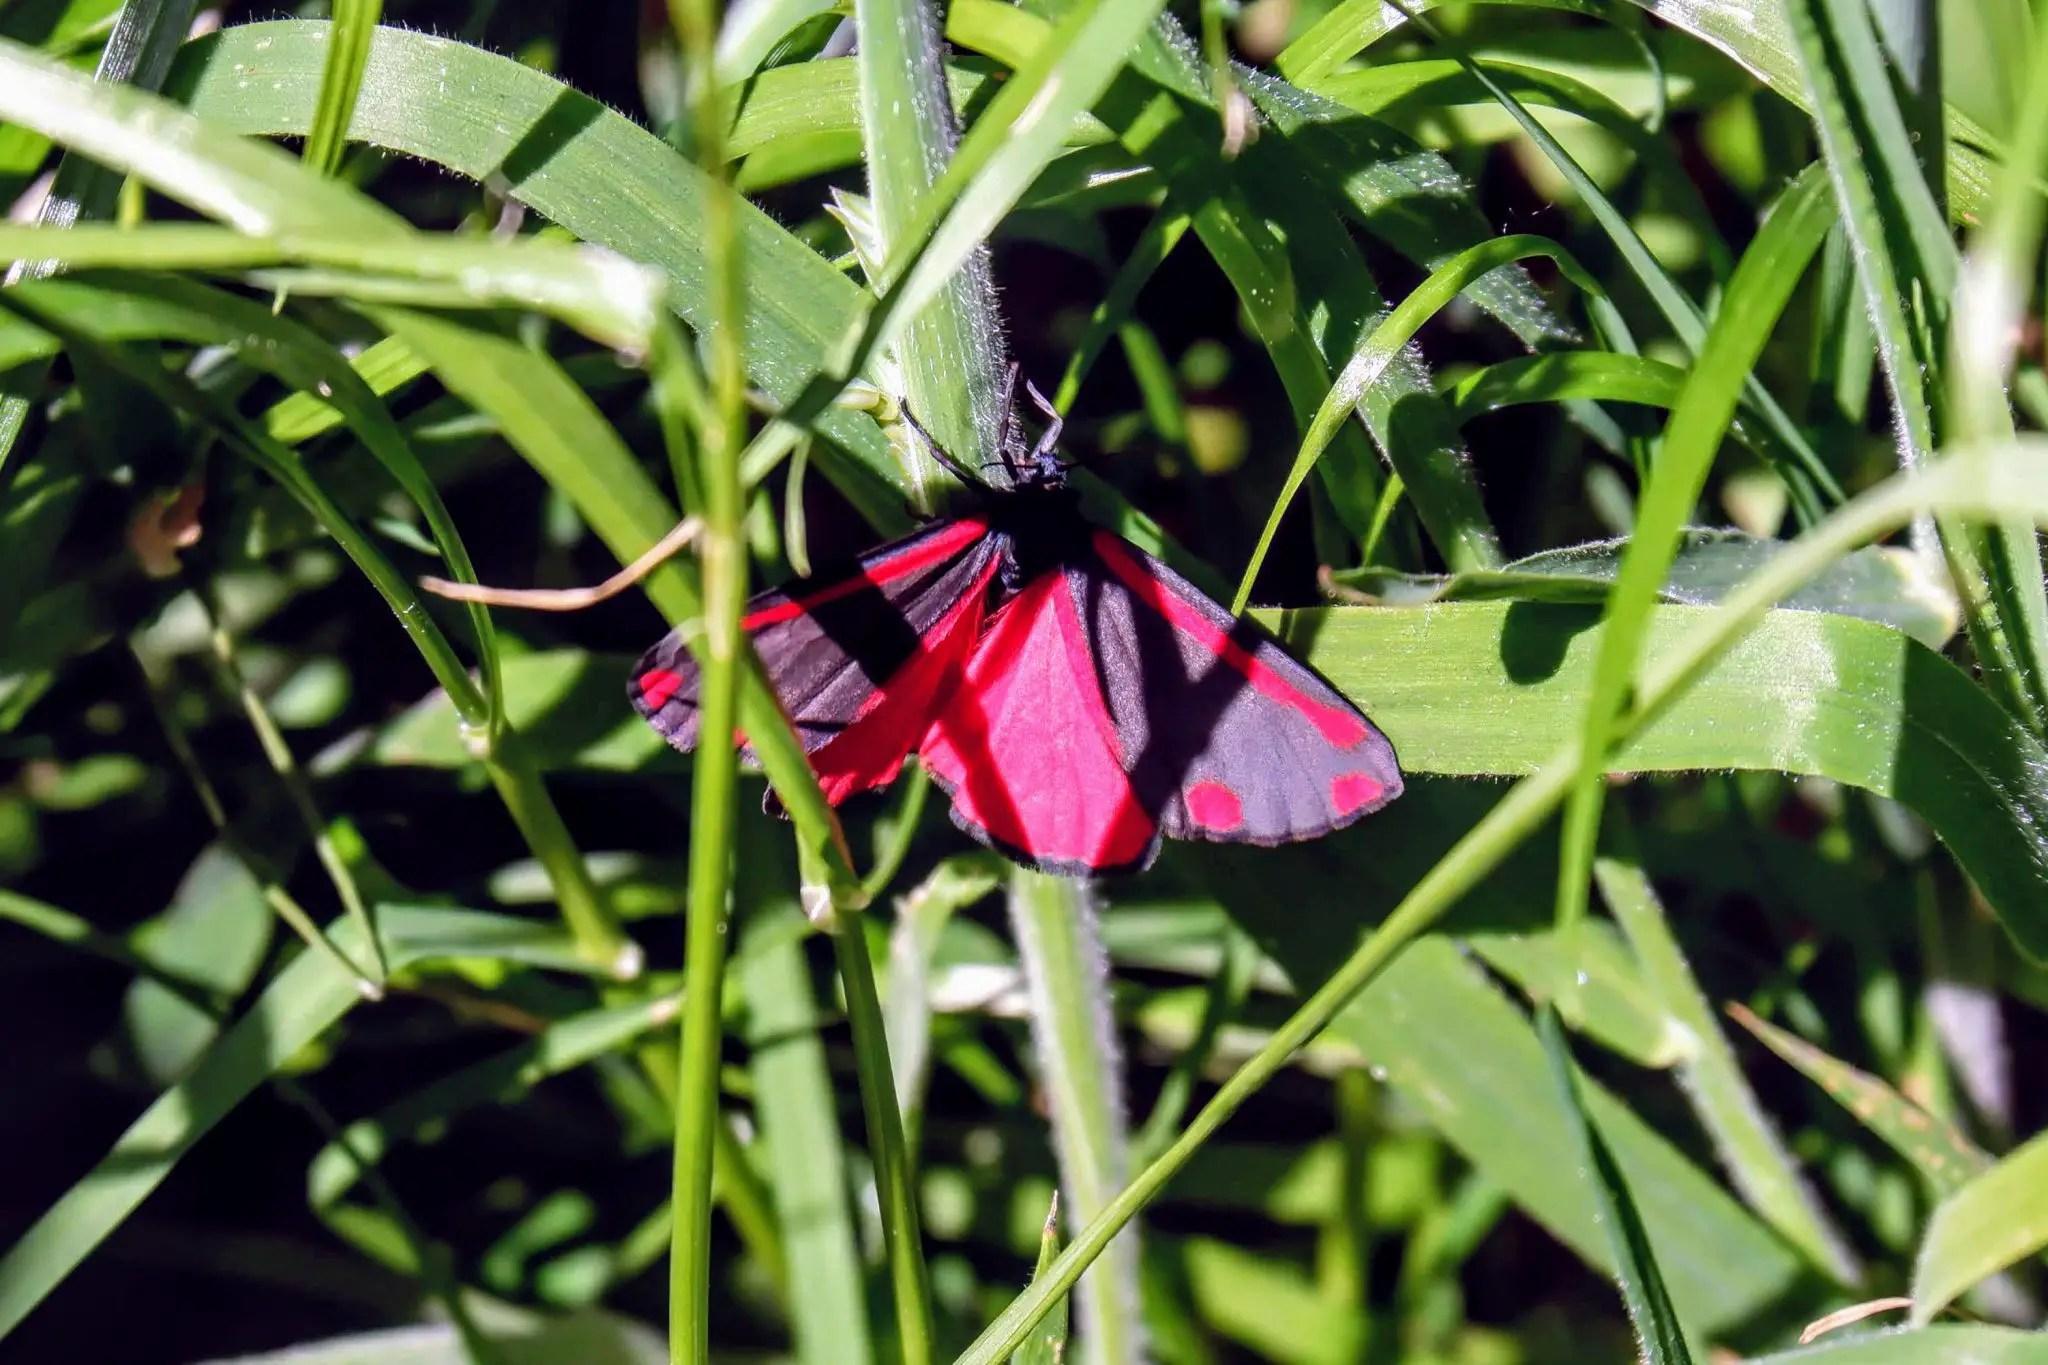 Cinnabar moth, Merseybank Estate, Manchester